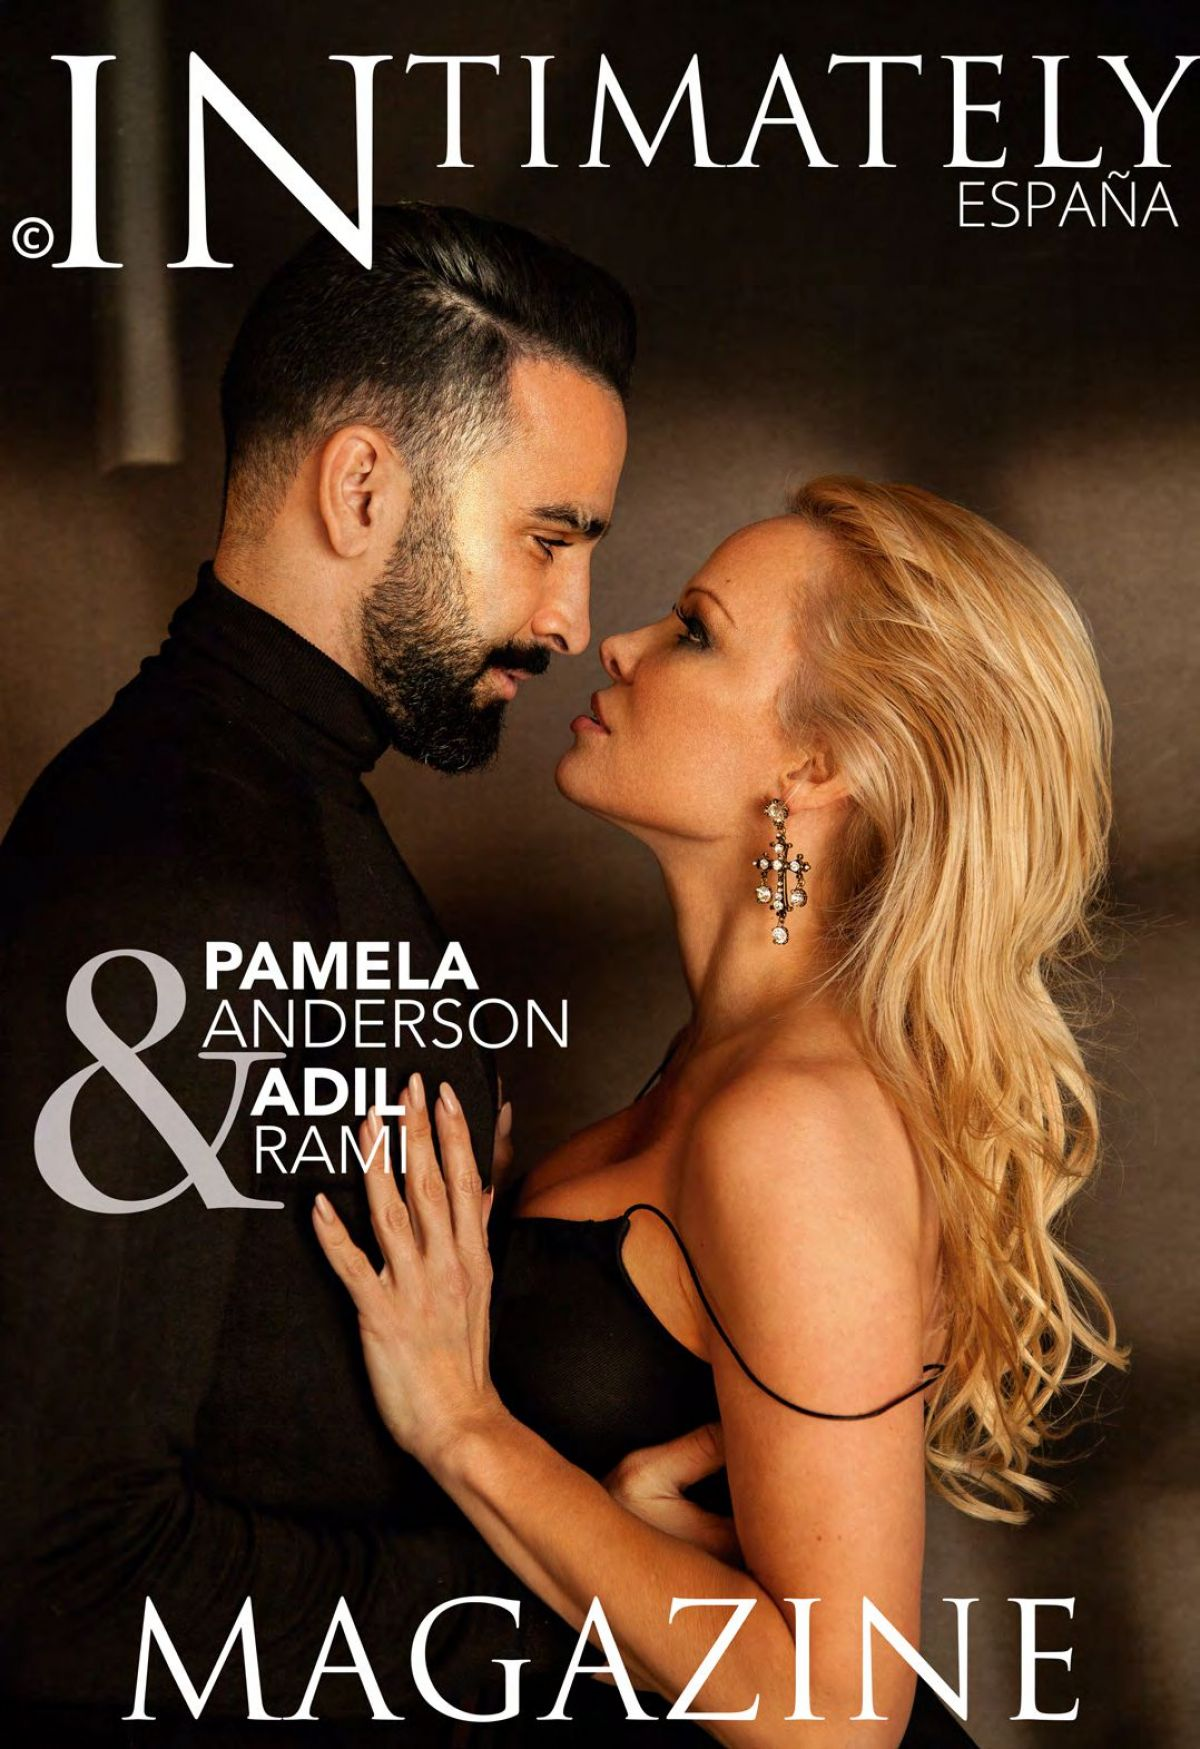 Anderson 2019 pamela The Stunning